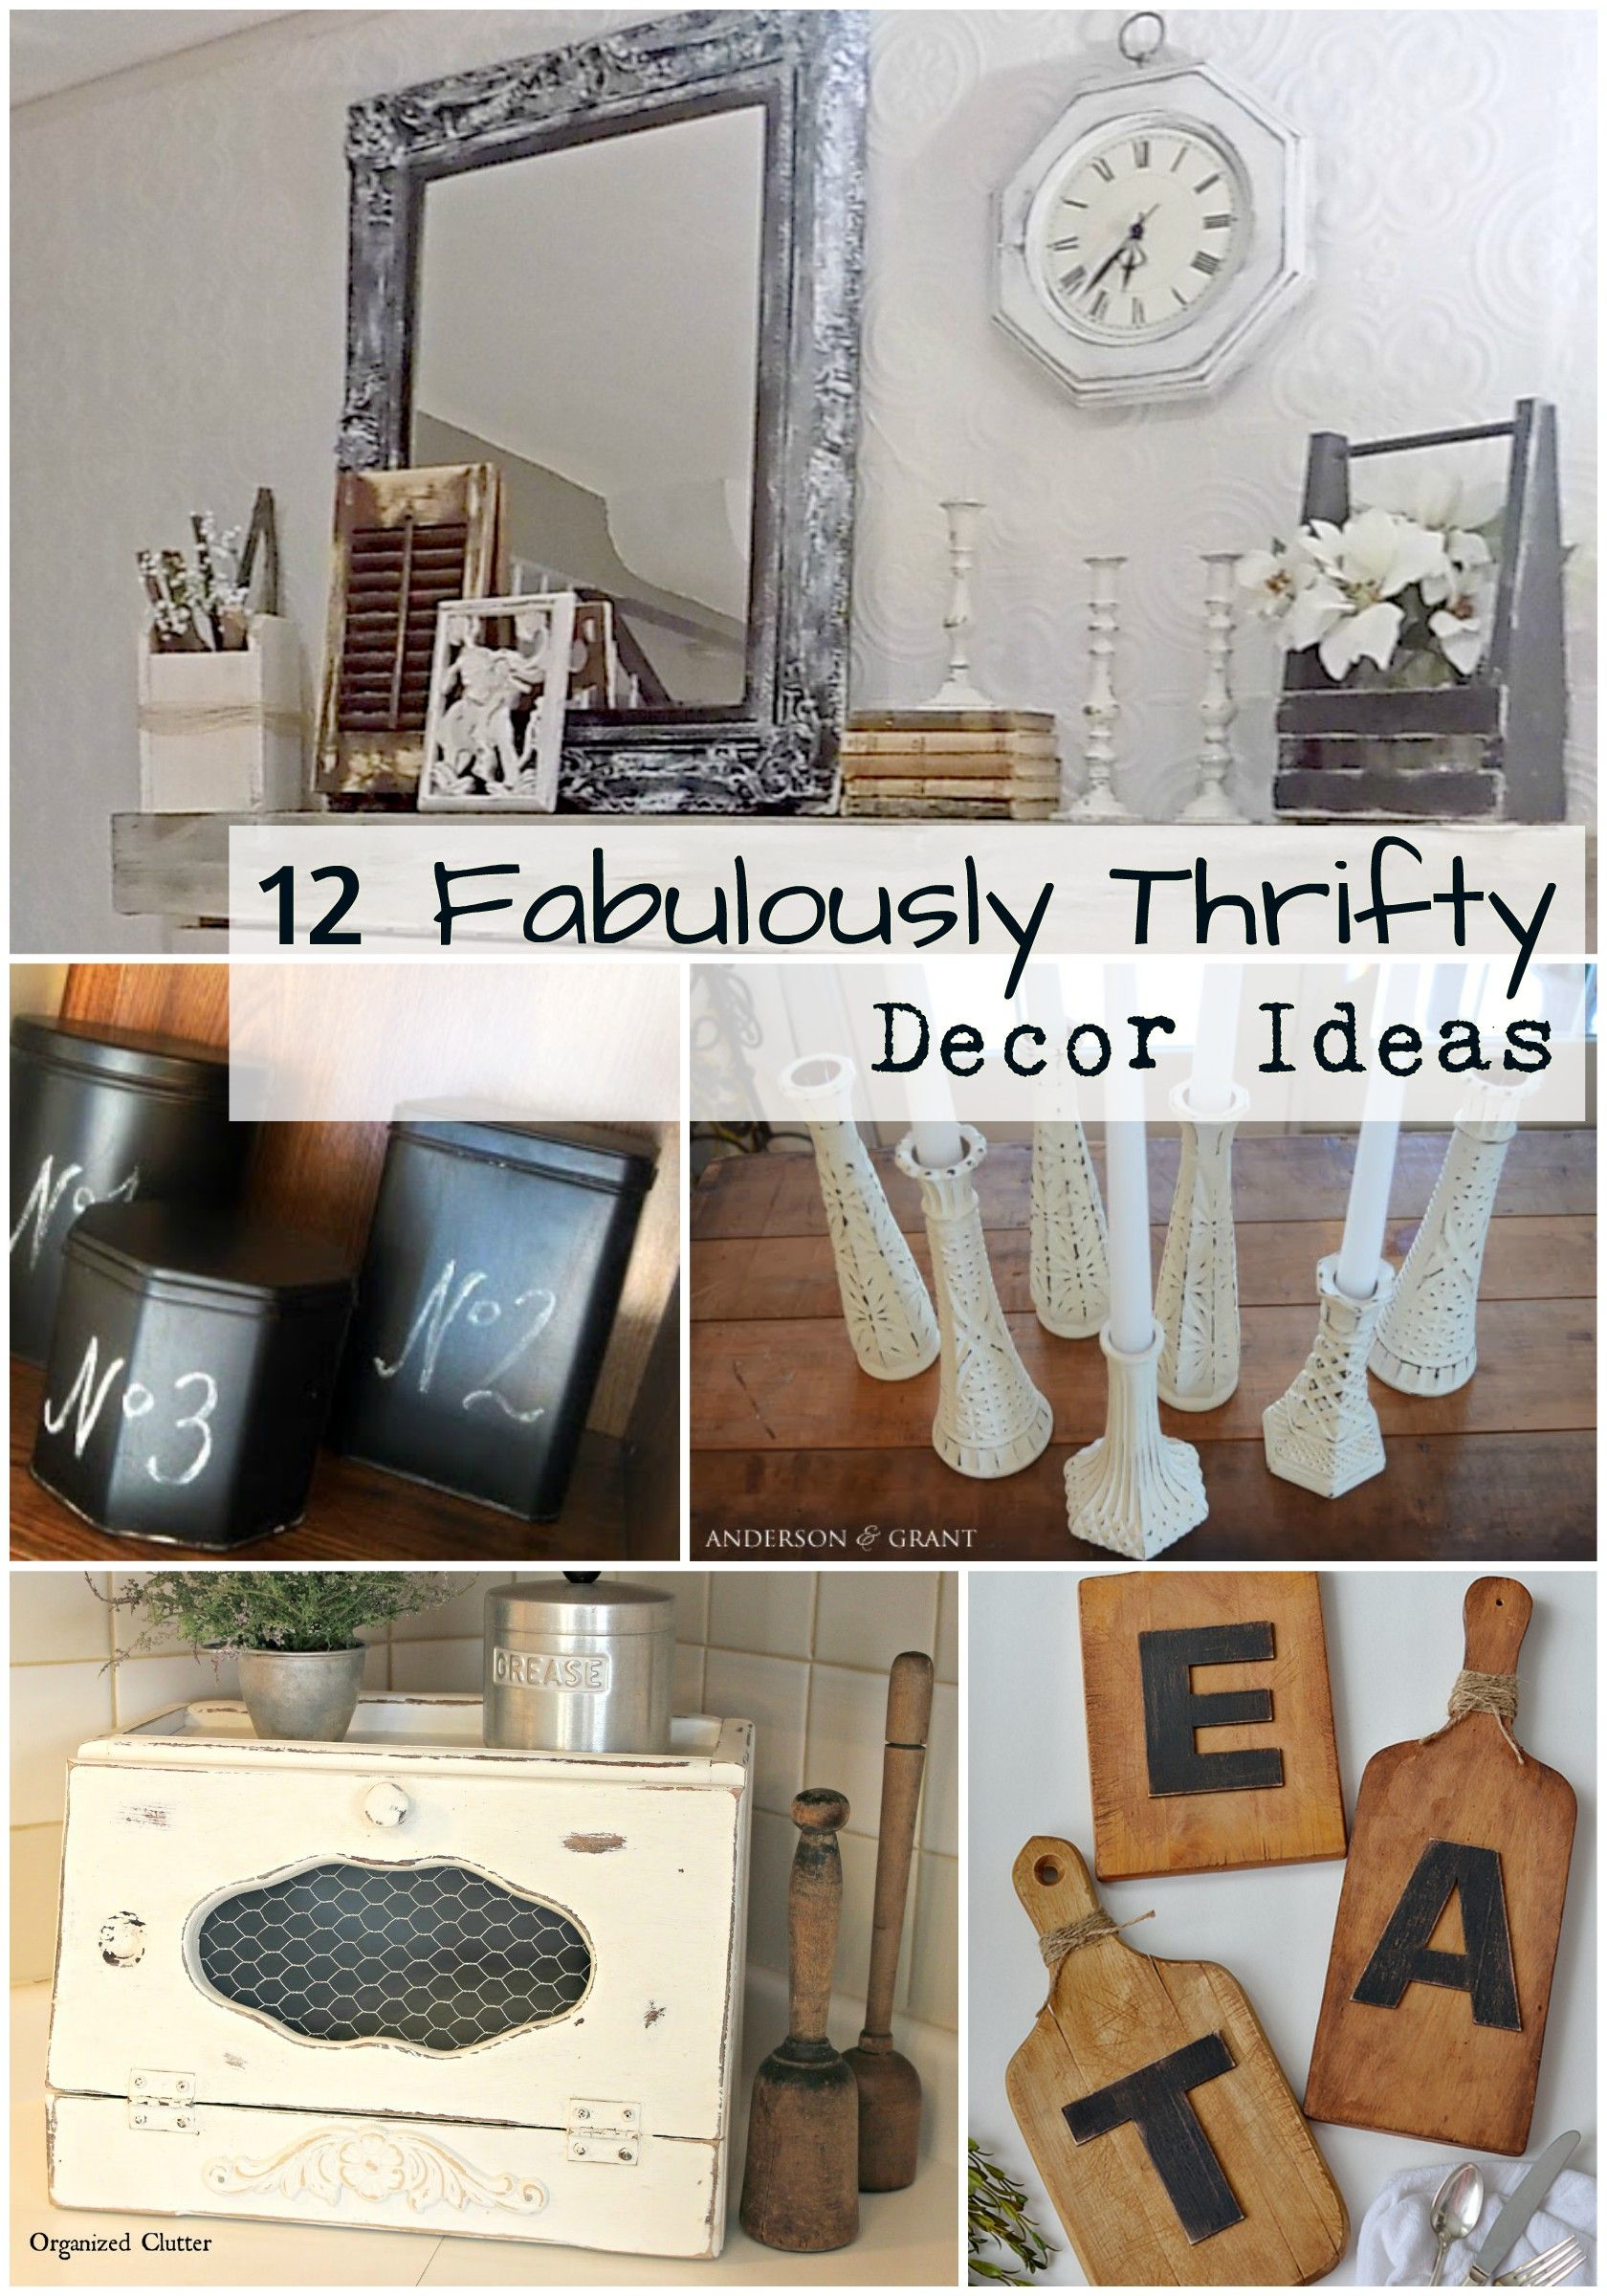 12 Fabulously Thrifty Decor Ideas Thrifty Decor Upcycle Decor